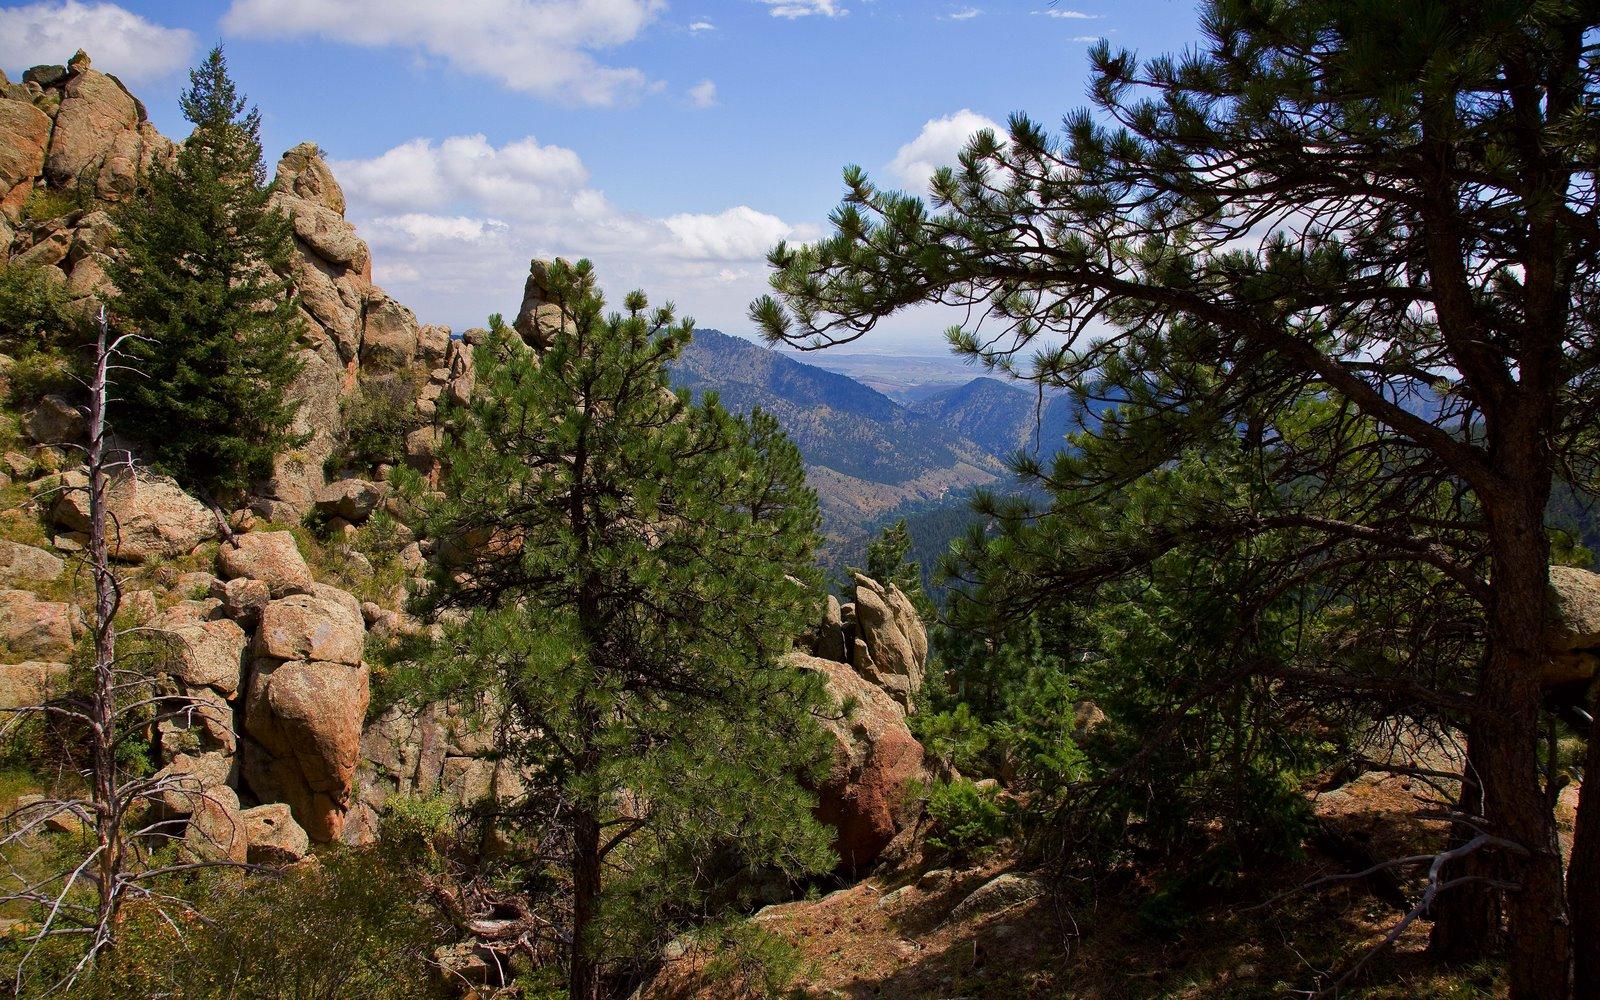 RonNewby: Trail to Round Mountain near Loveland Colorado